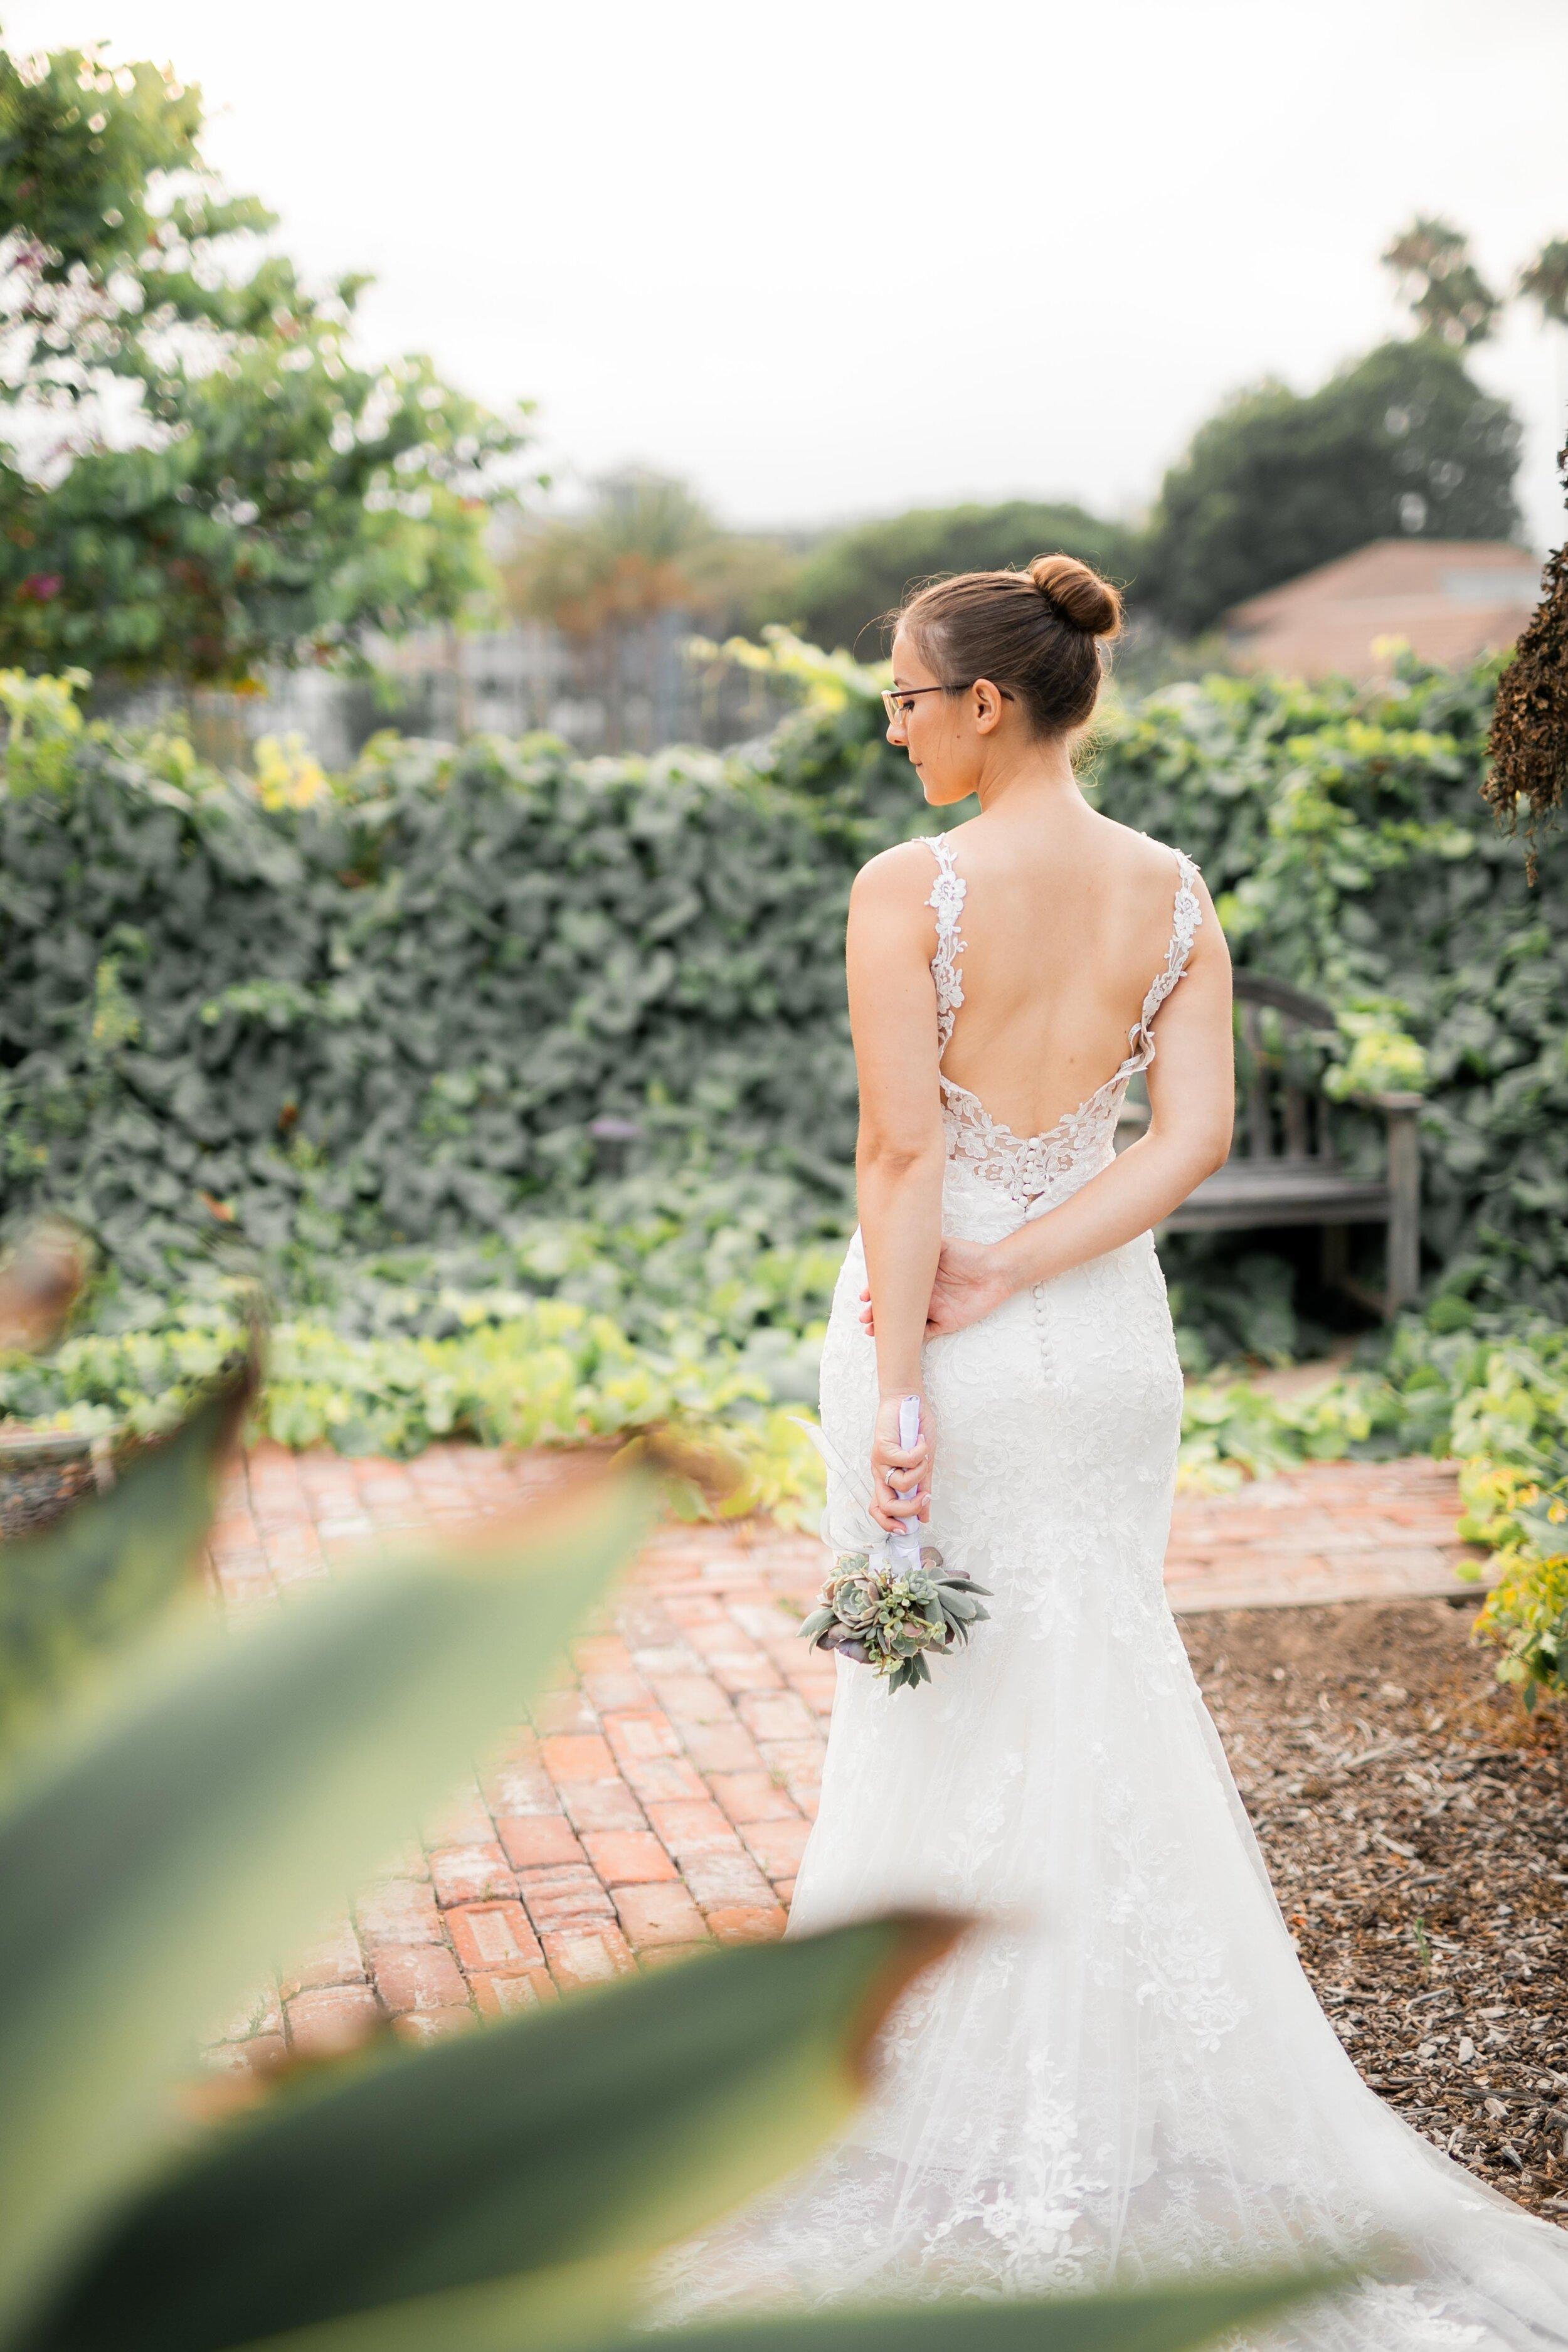 newland_barn_hungtington_beach__photoshoot_joshuachun_wedding-1265.jpg